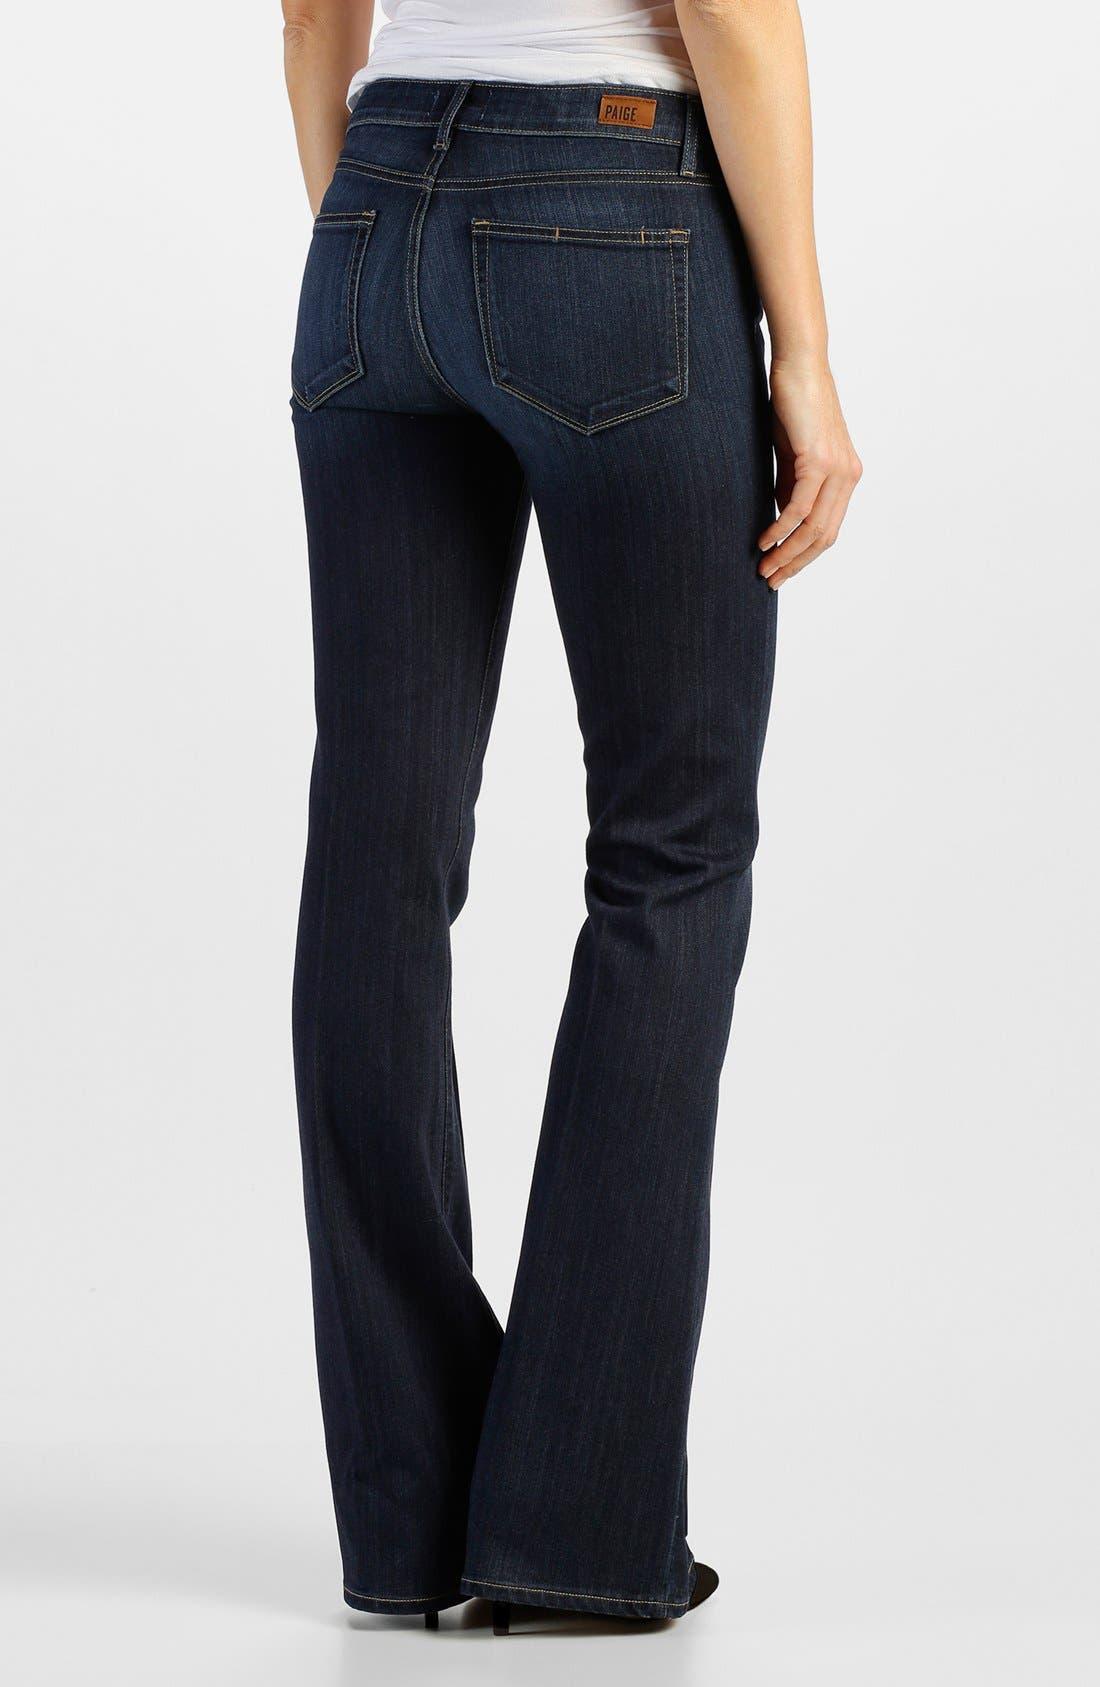 Alternate Image 2  - Paige Denim 'Skyline' Bootcut Jeans (Alanis)